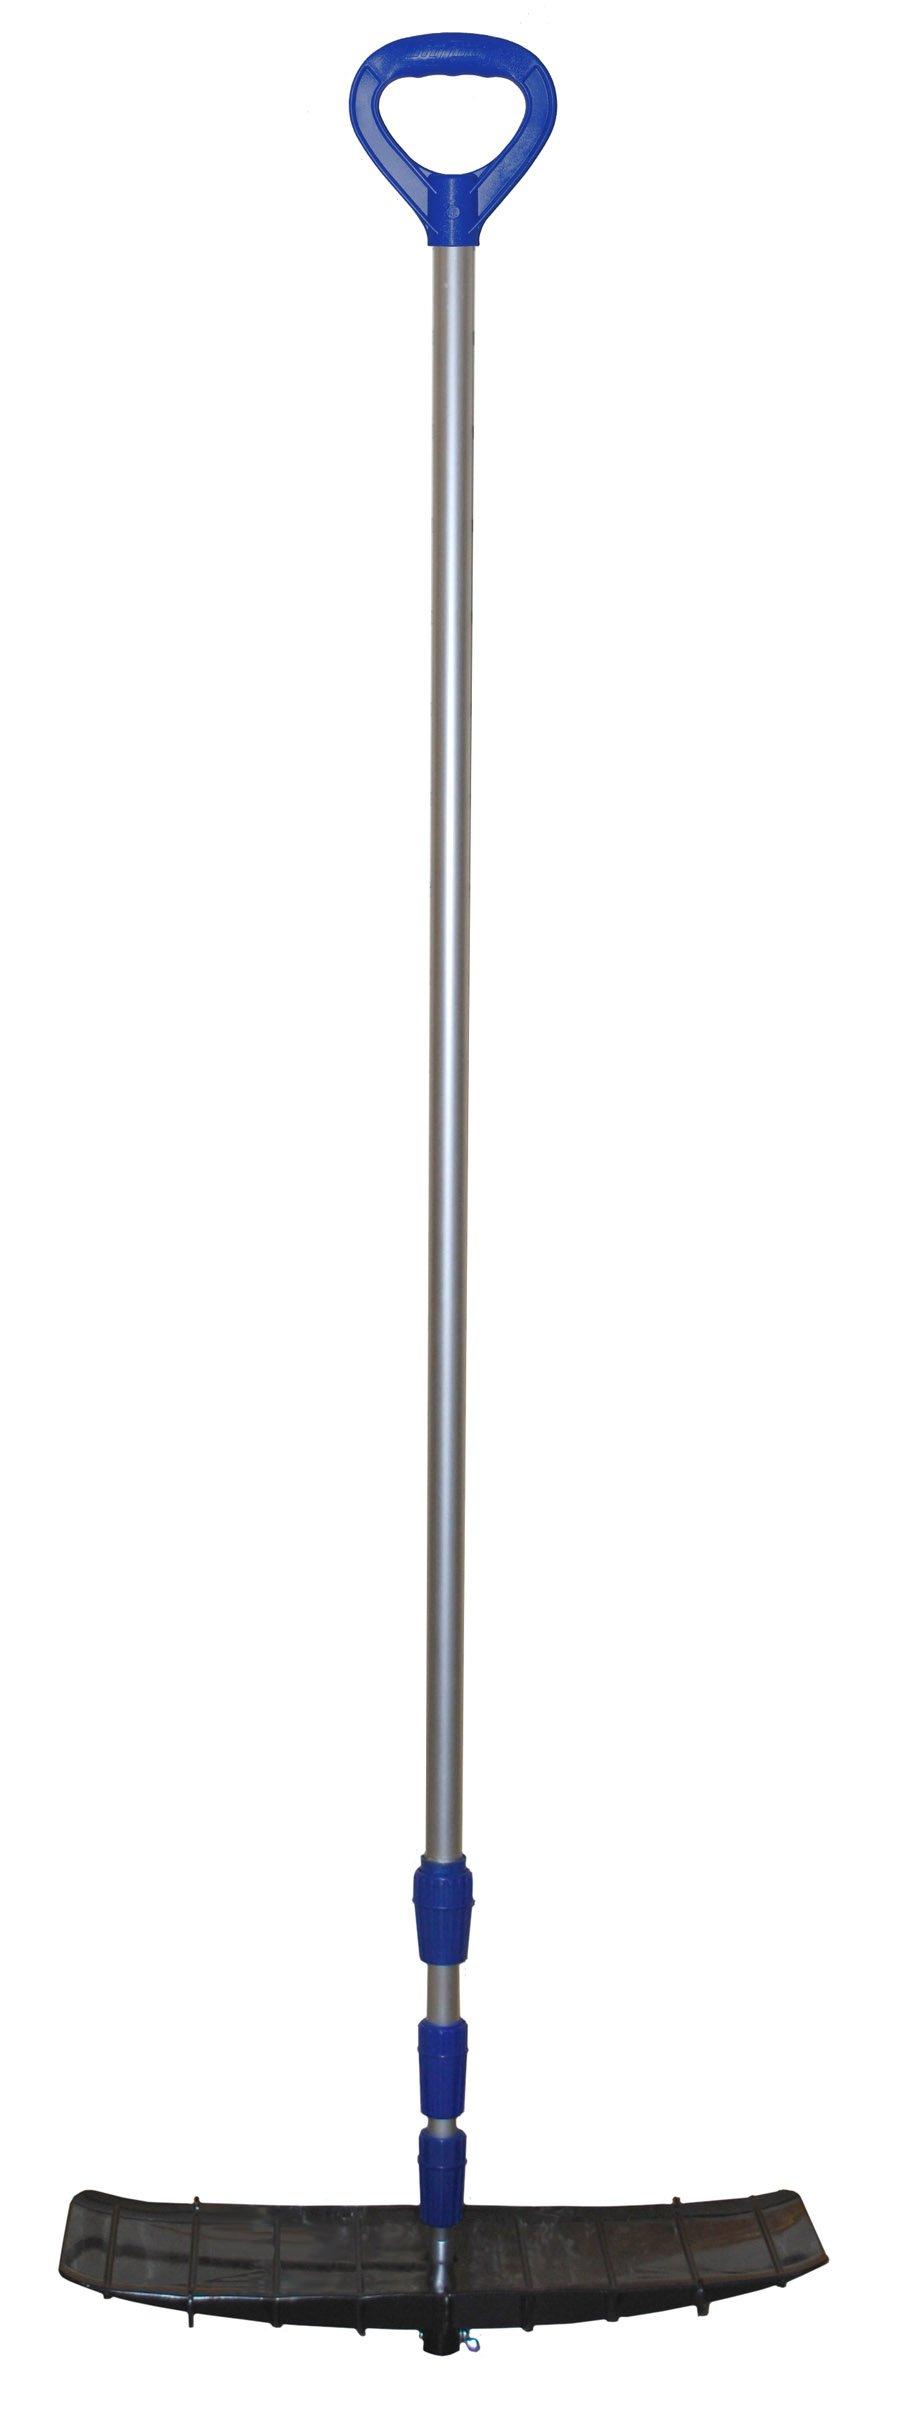 Bigfoot 21' Flip & Strip Poly Roof Rake - Telescoping Handle - Shingle Ski by Emsco Group